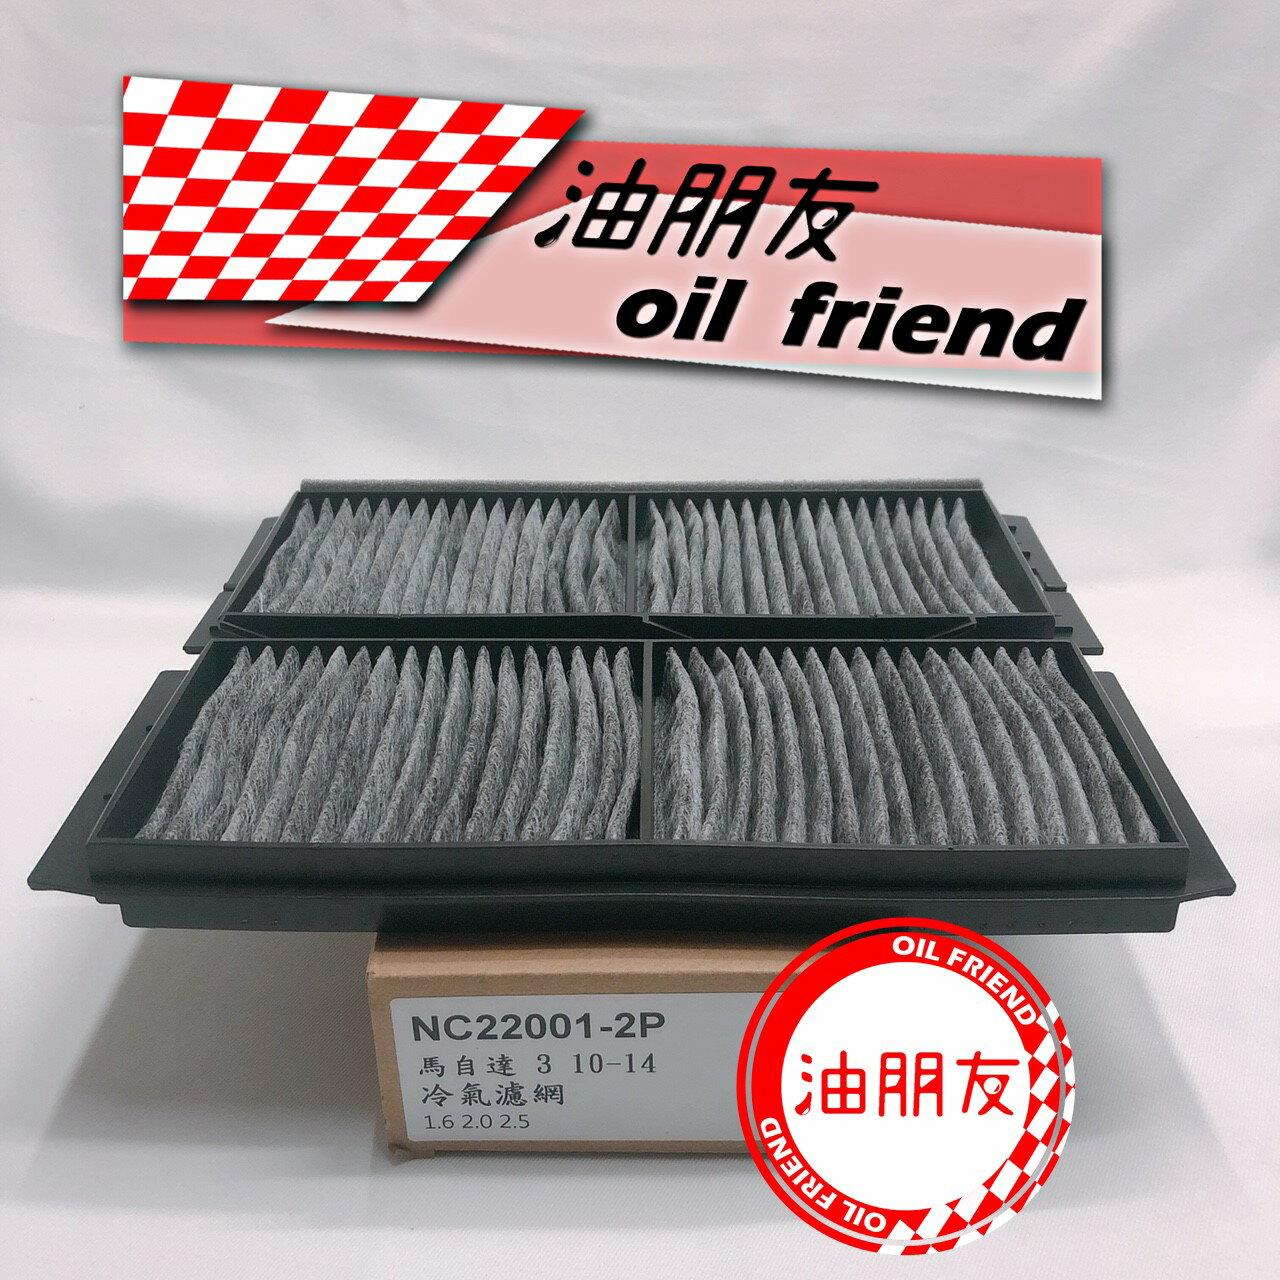 -油朋友- mazda3 1.6 2.0 2.5 10-14 冷氣芯 冷氣濾網 馬自達 mazda 3 2.0 10-14